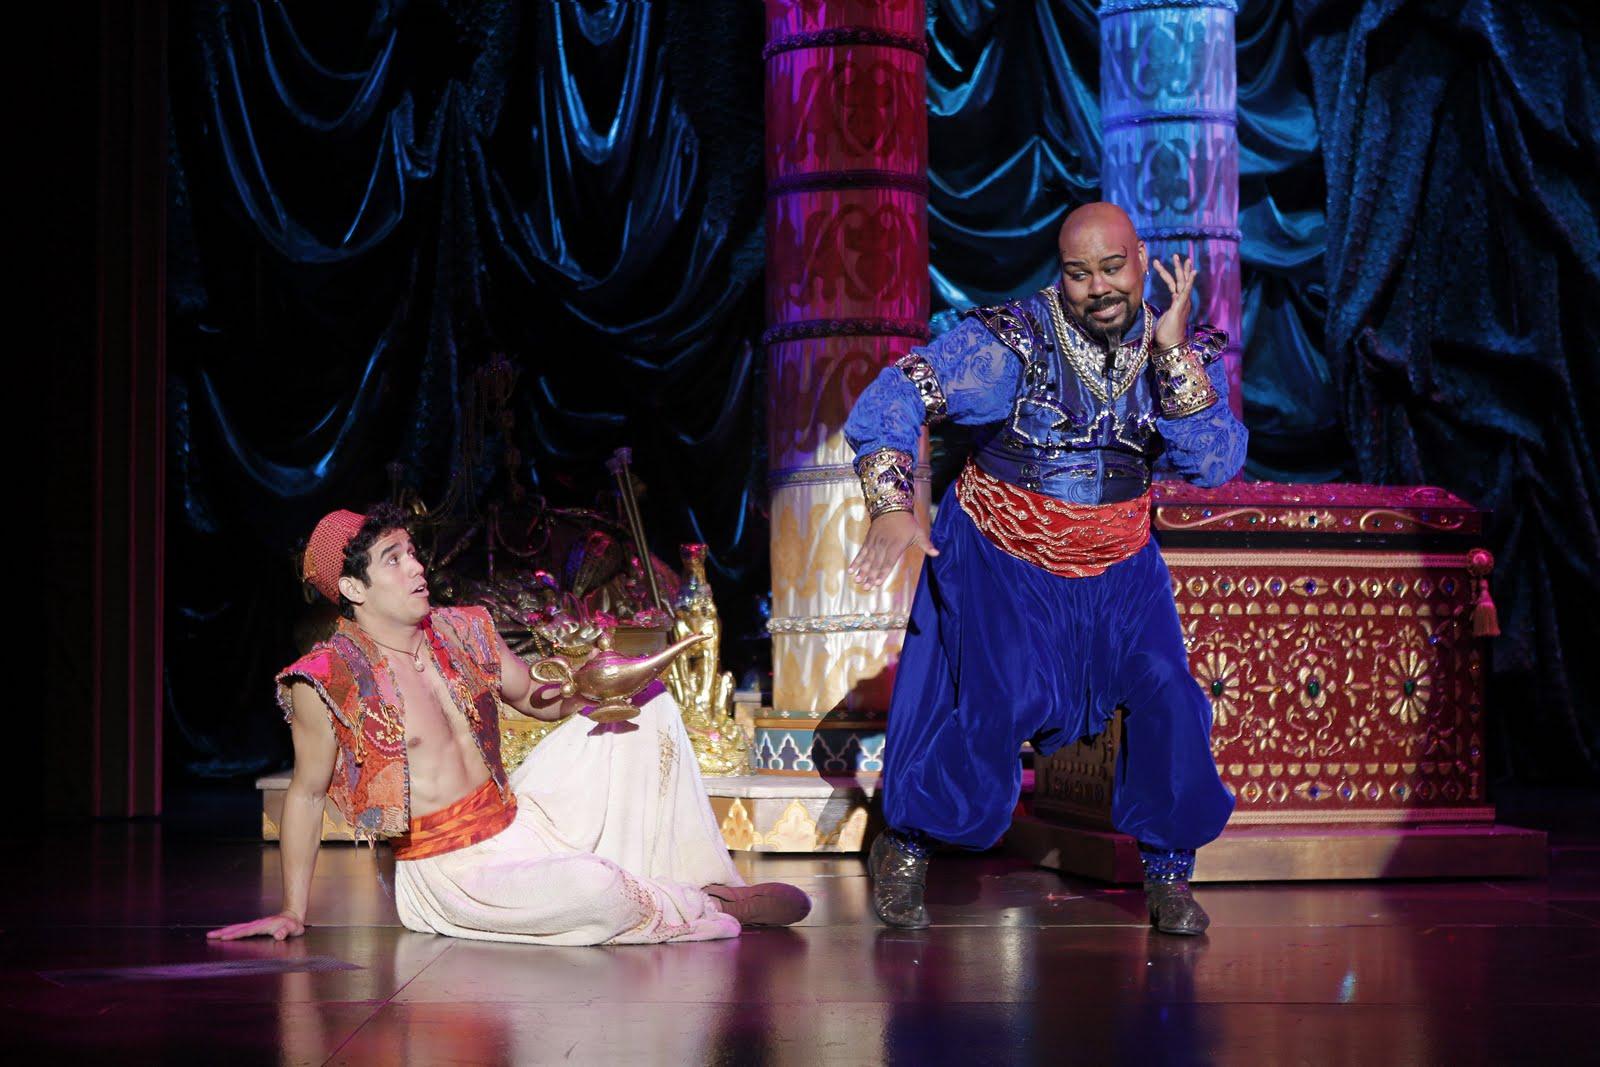 Aladdin Spiel